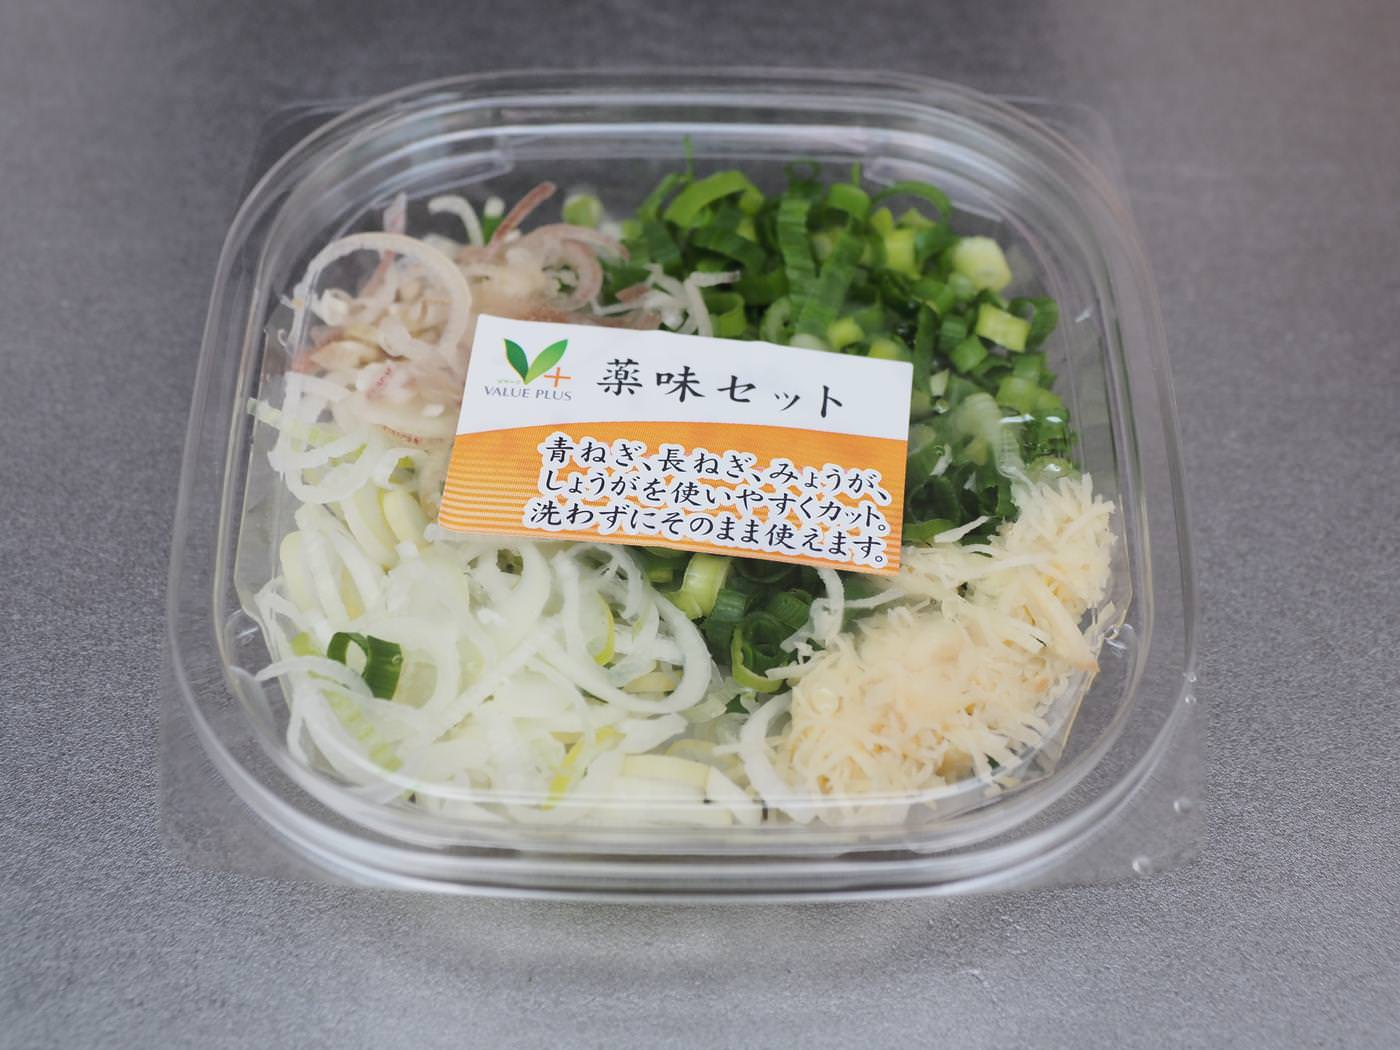 how to make super savory hiyashiru from miyazaki 00005